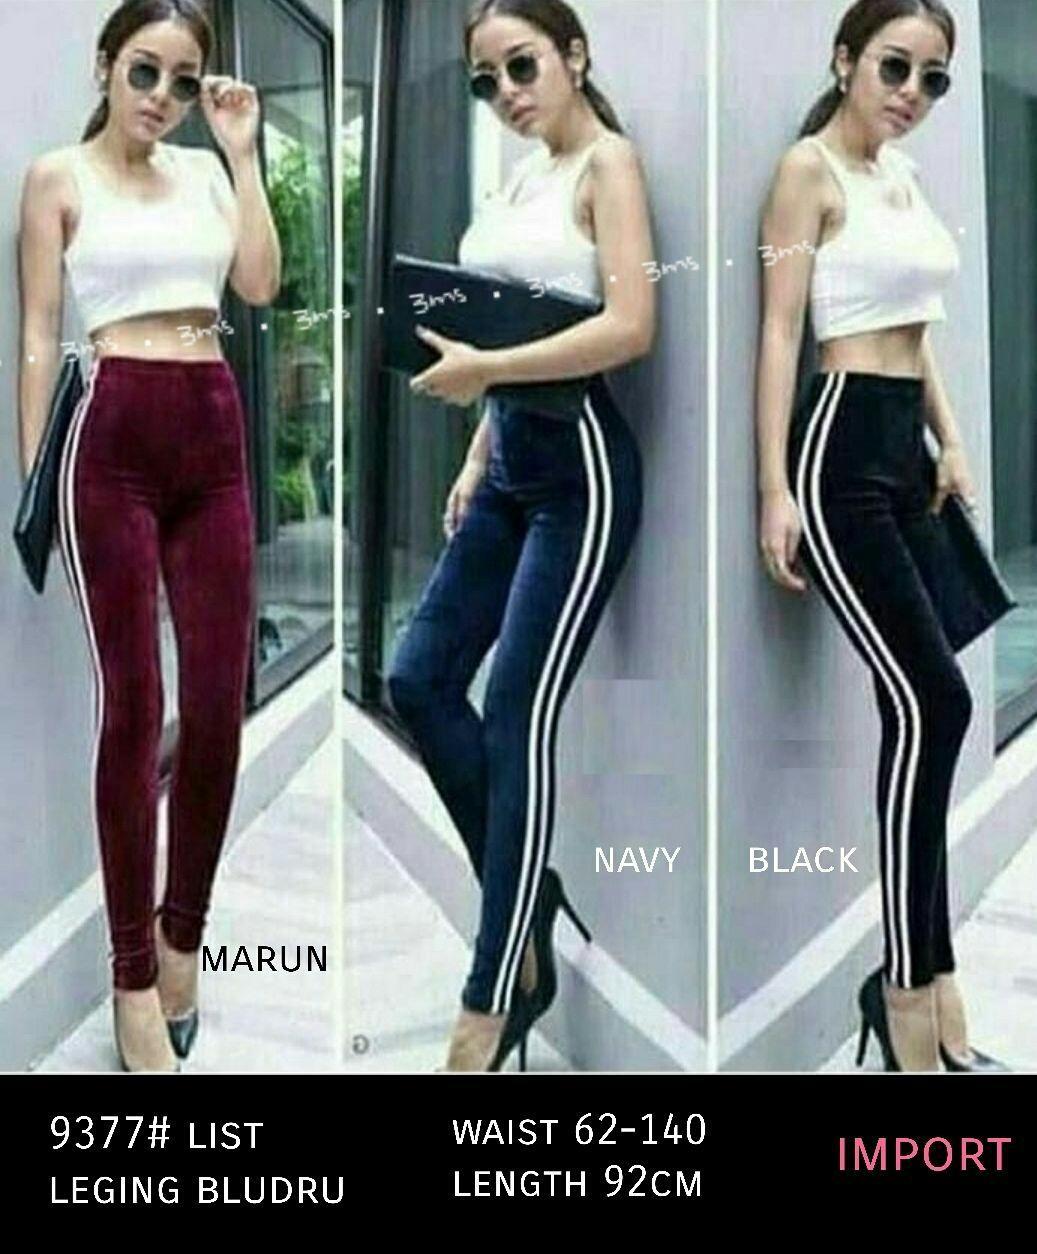 Fjco Bm 9377 Leging Bludru List Legging Wanita Celana Wanita Lazada Indonesia